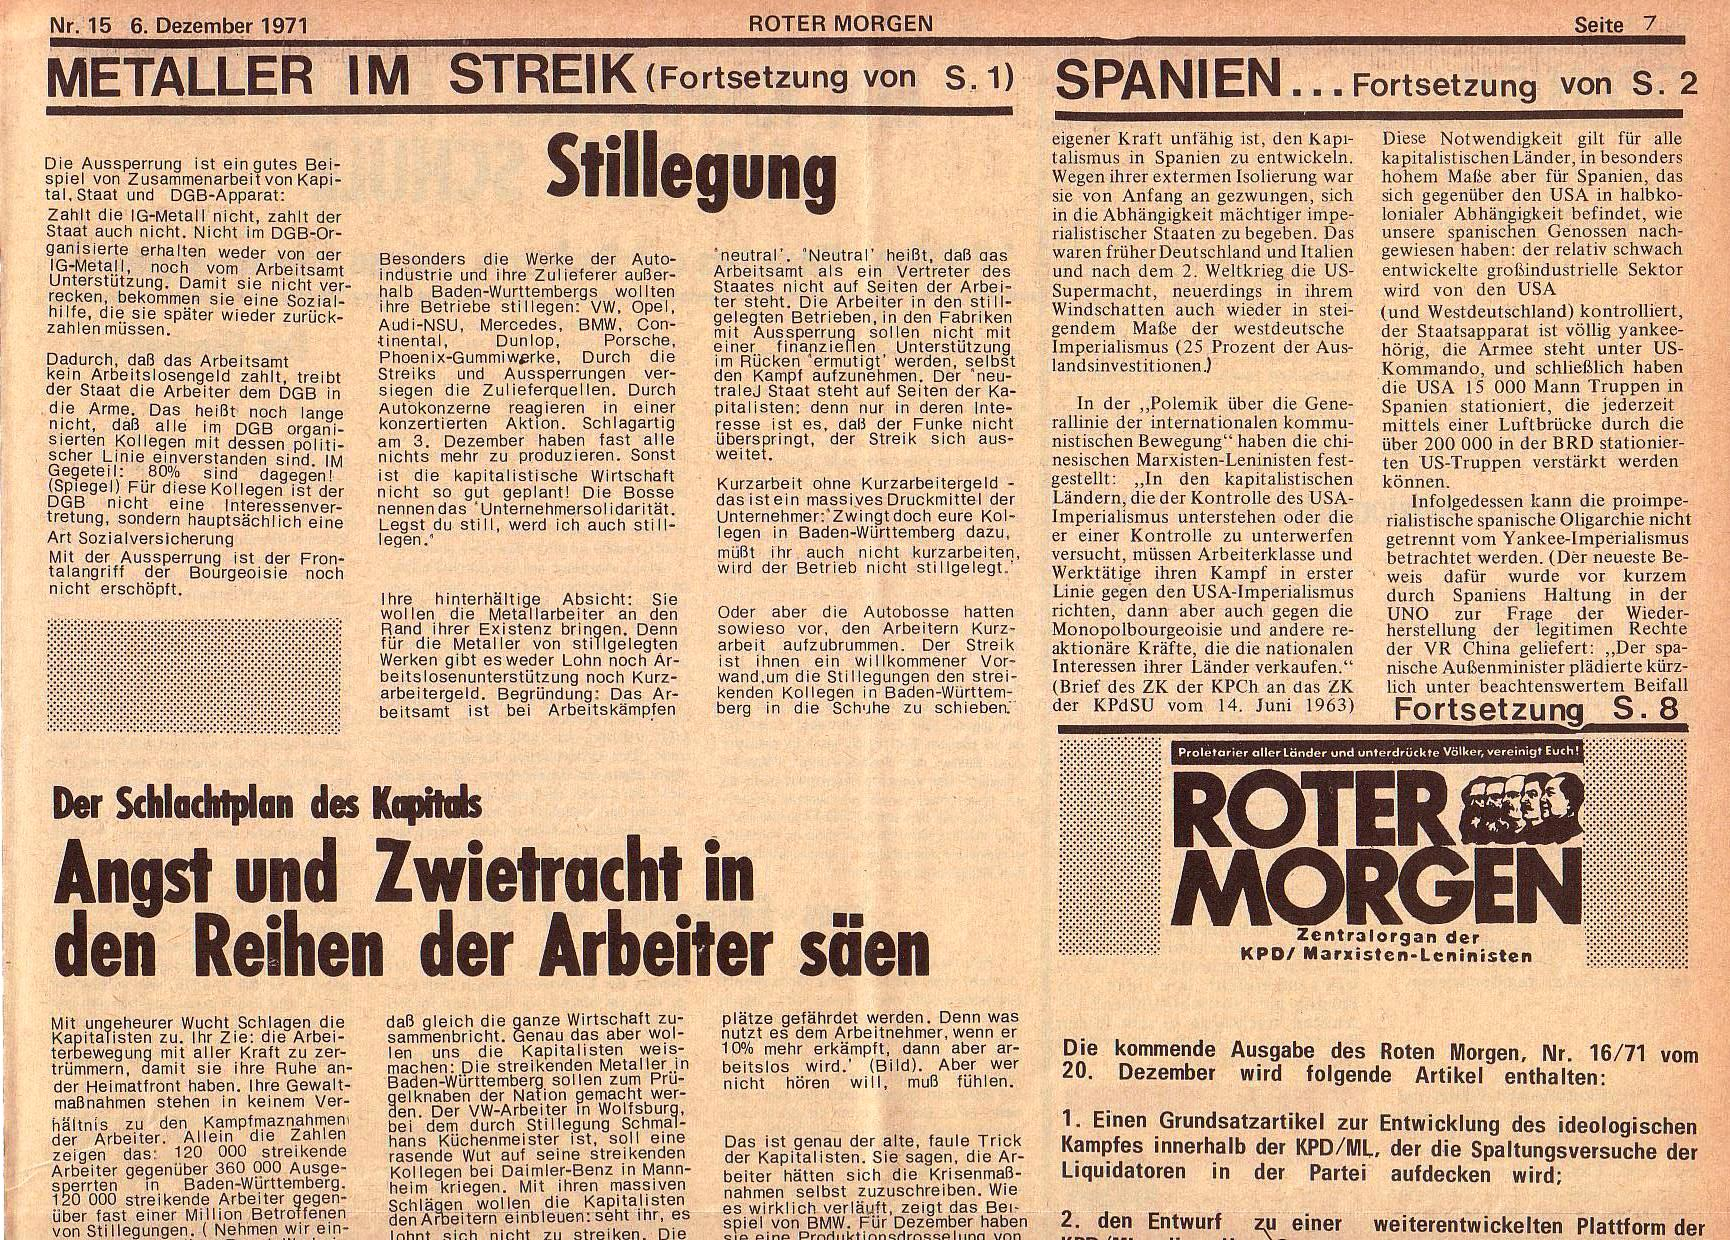 Roter Morgen, 5. Jg., 6. Dezember 1971, Nr. 15, Seite 7a